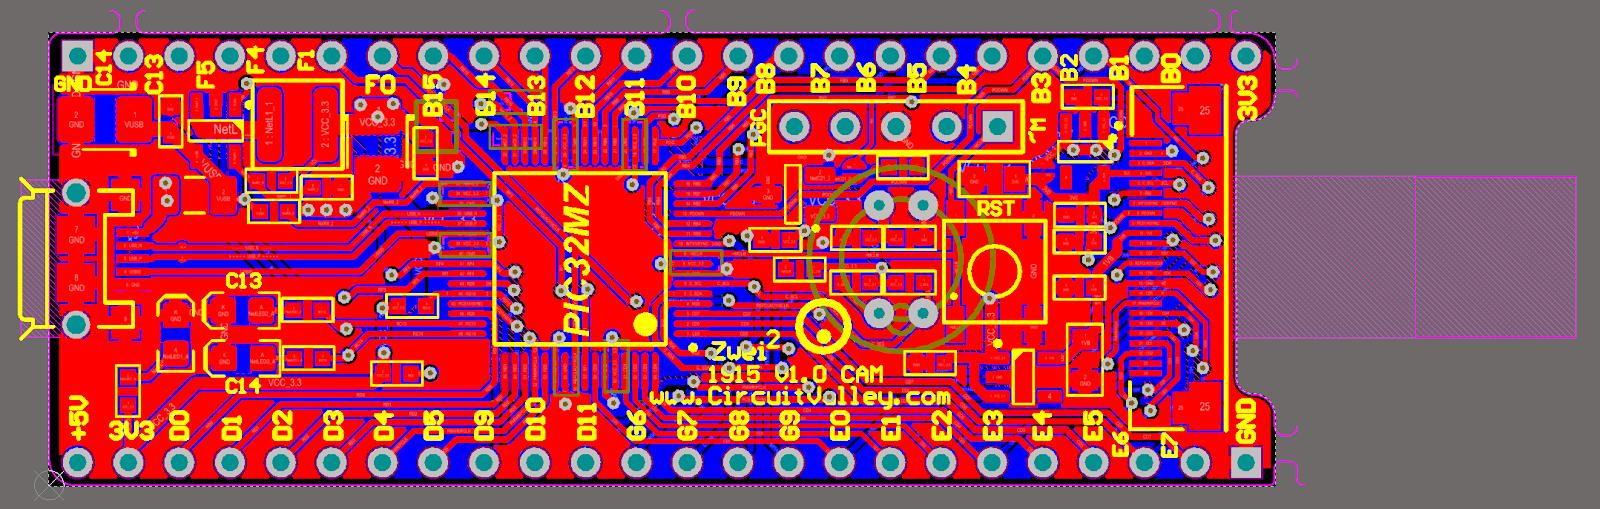 Embedded Engineering : OpenSource DIY USB Webcam: OV7670